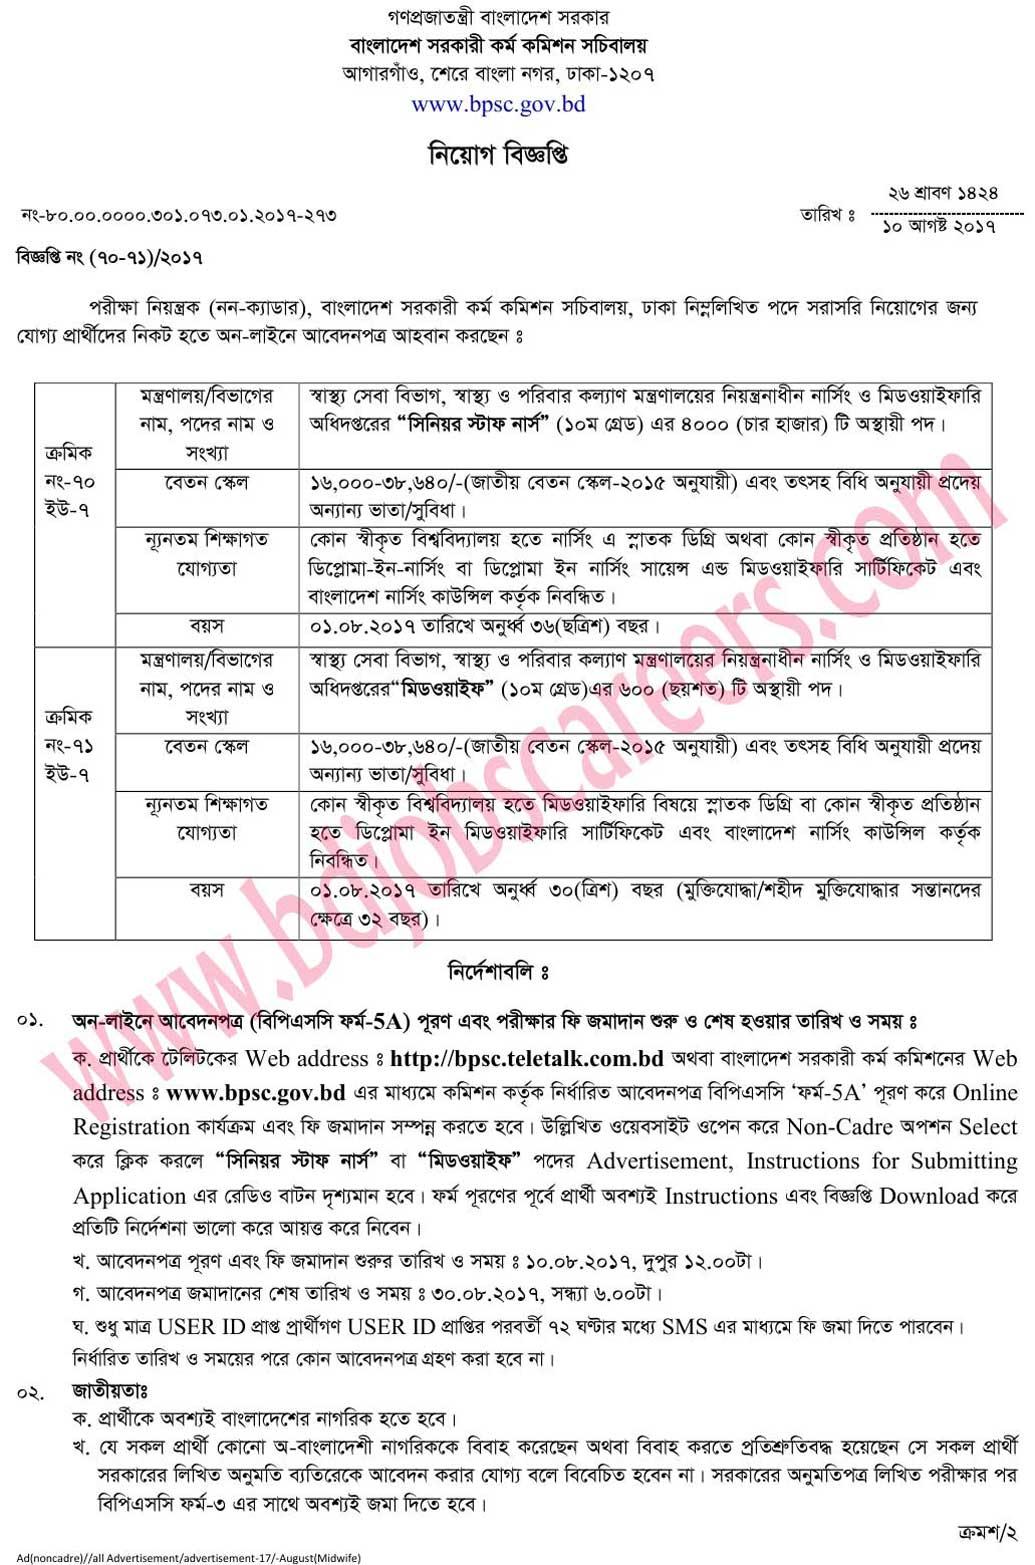 Ministry of Health and Family Welfare Job Circular 2017